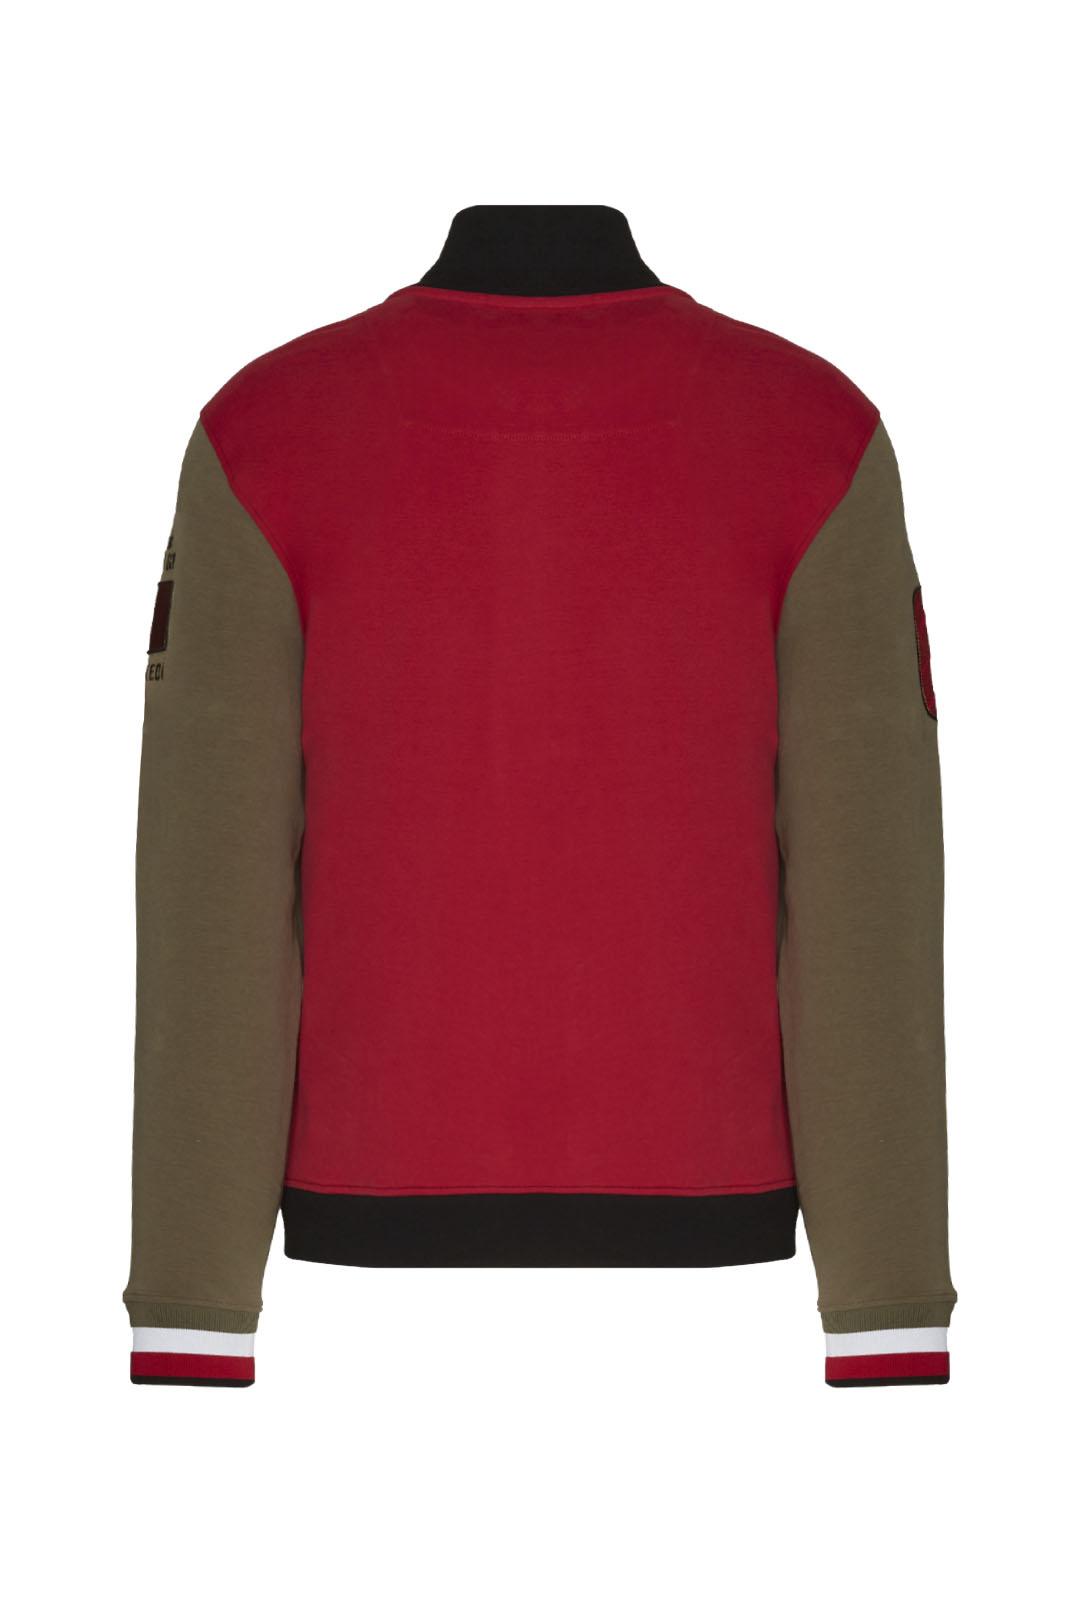 Sweatshirt 155° Gruppo Pantere Nere      2